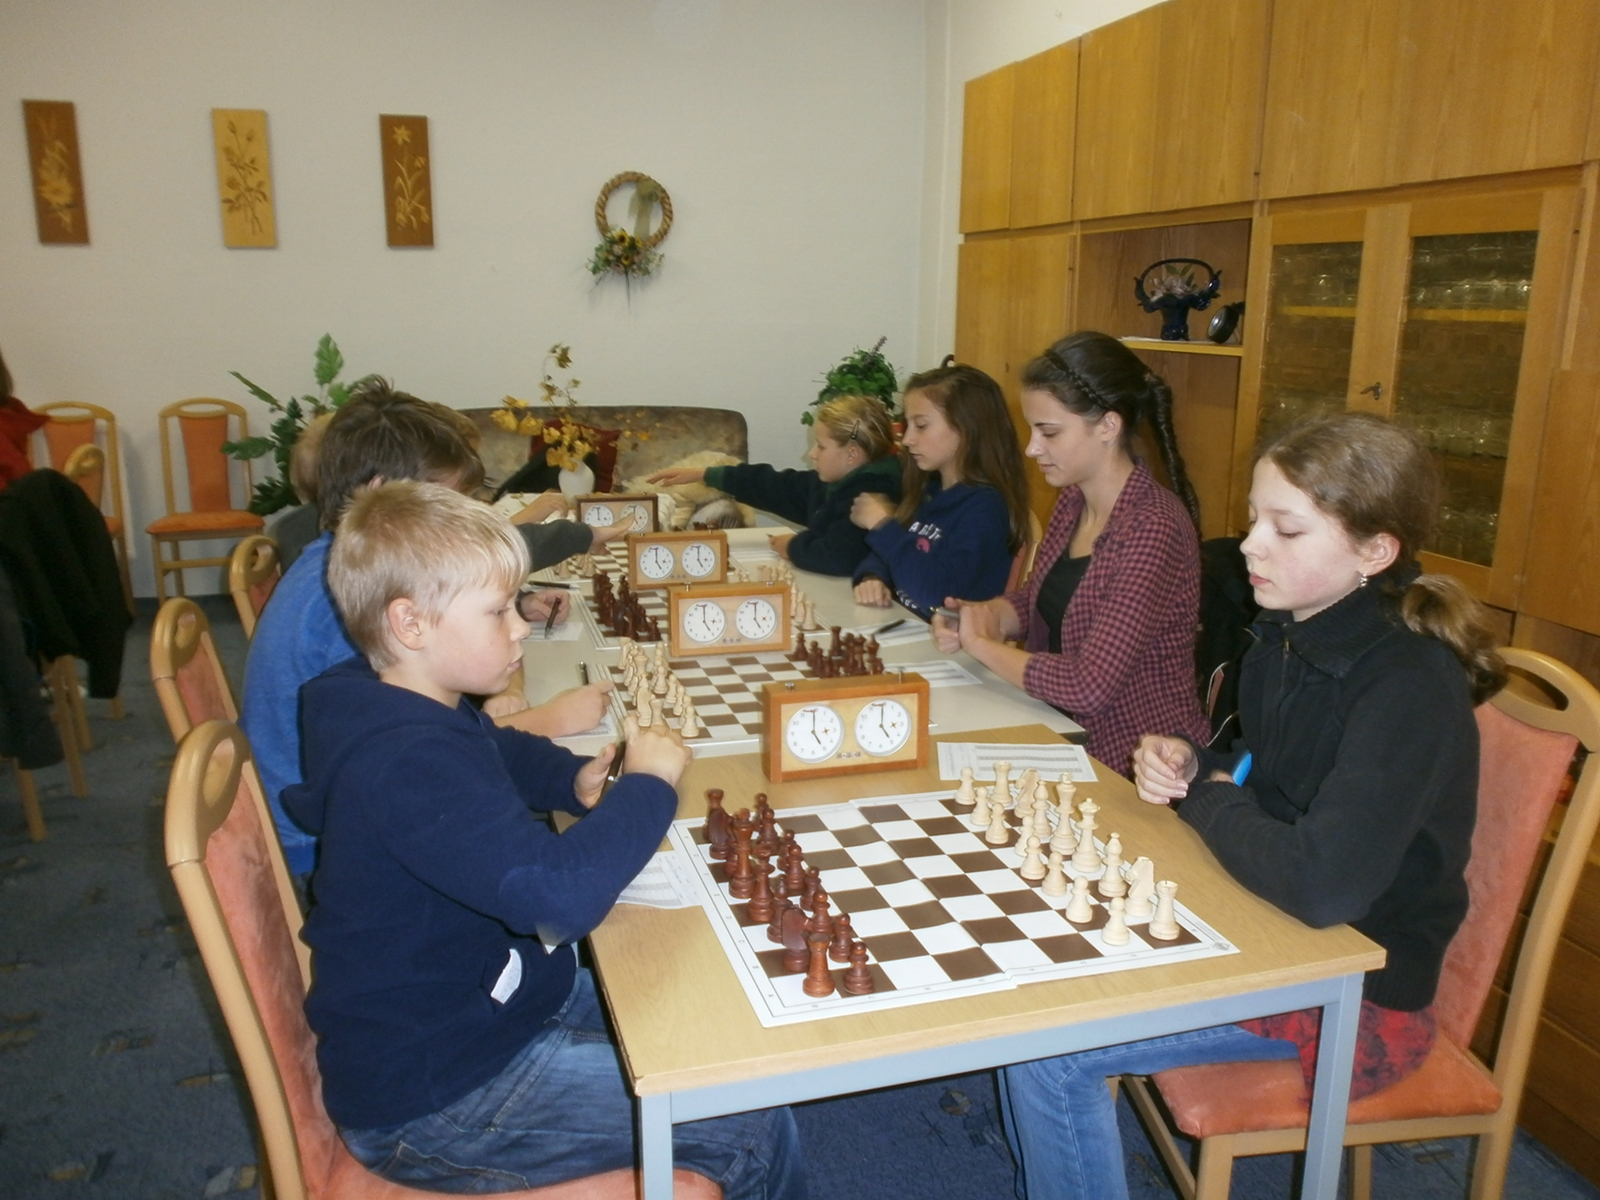 Vergleichswettkampf Torgelow gegen Berlin 2014 - Teil 2